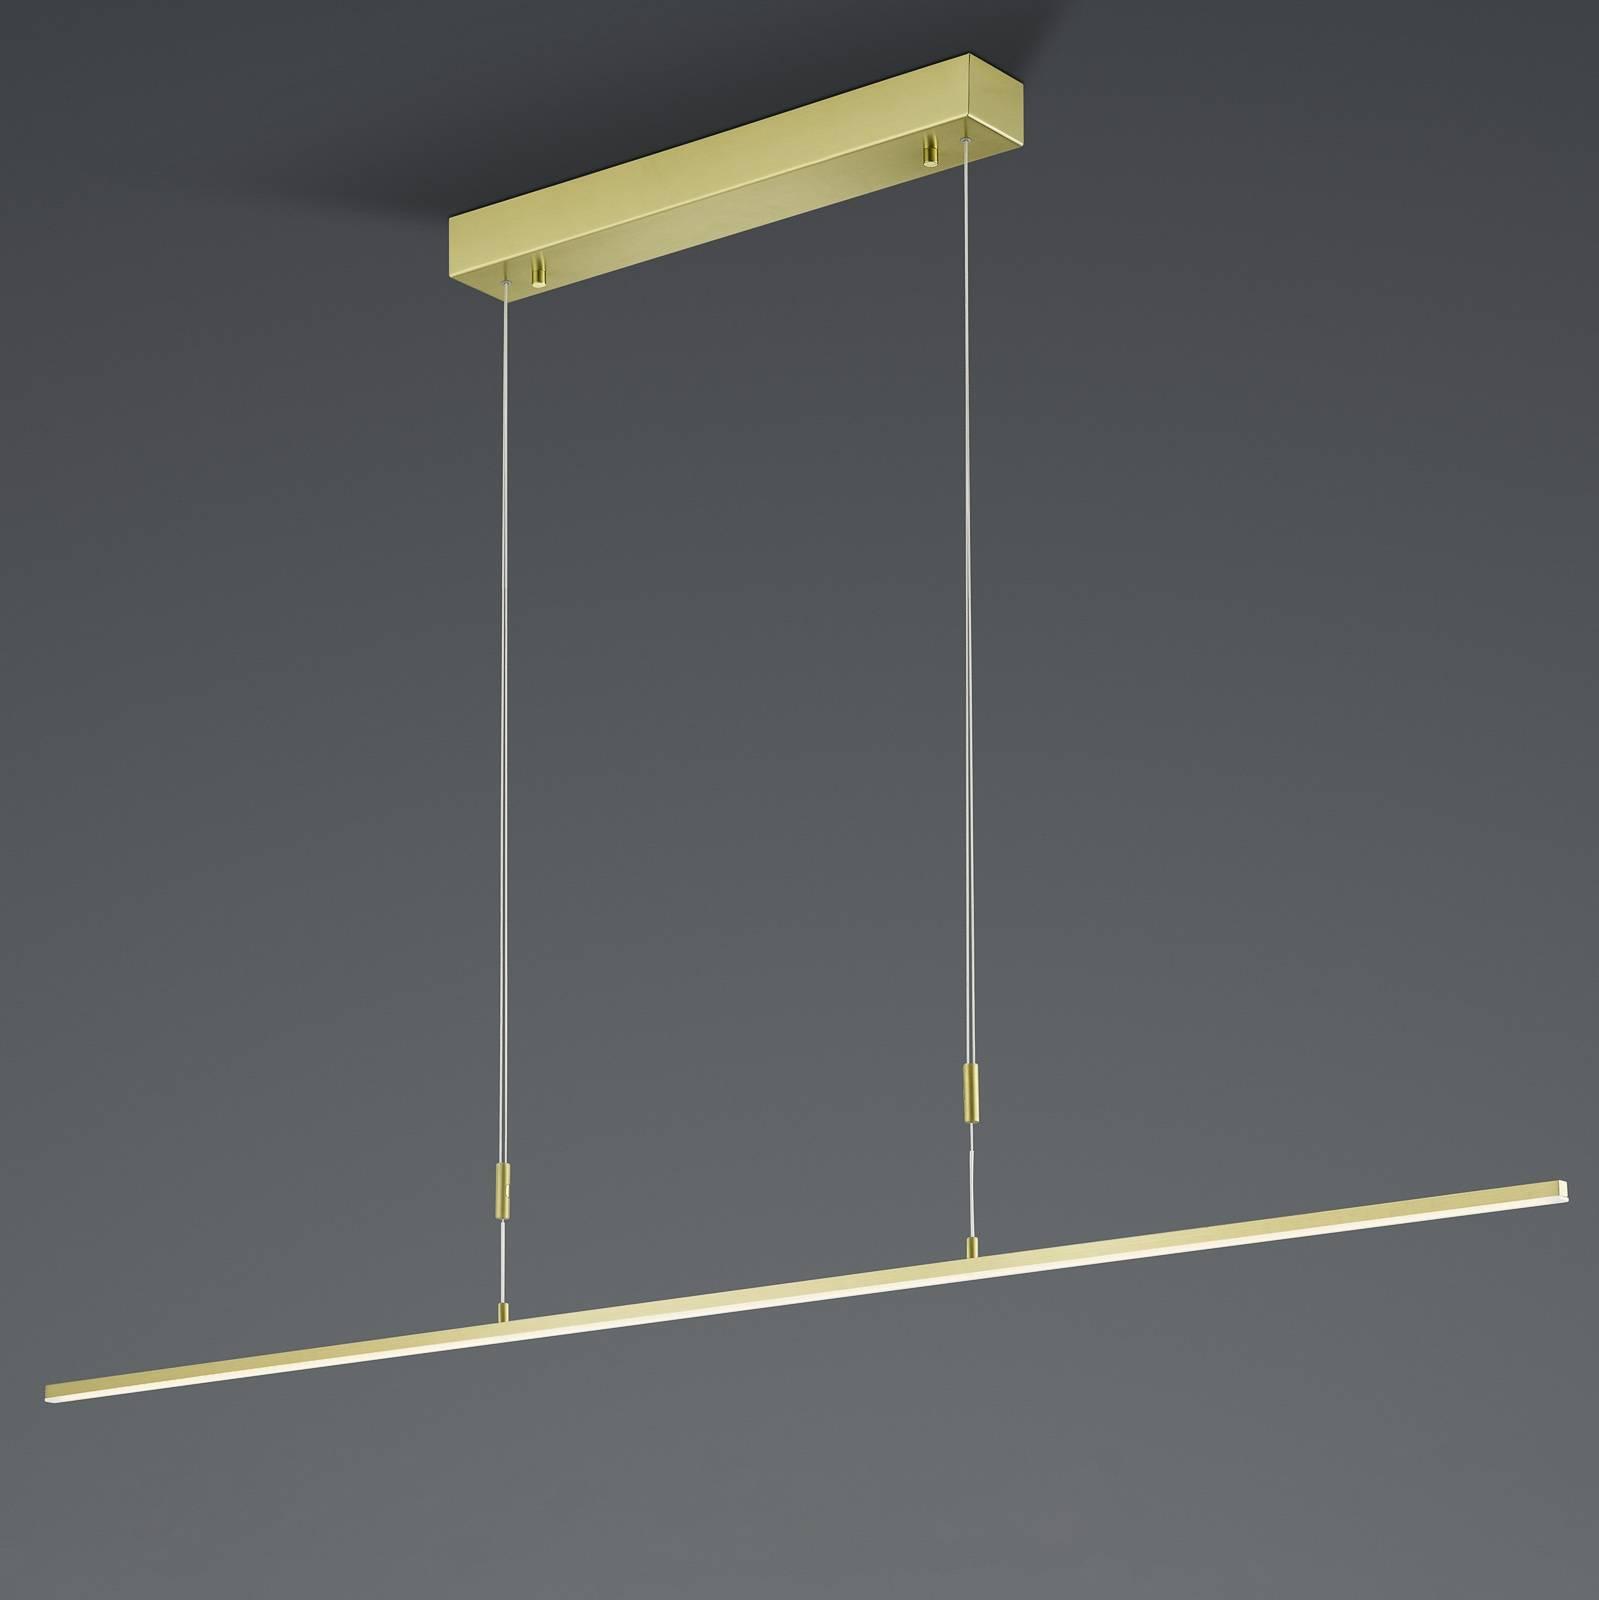 BANKAMP Slim hanglamp ZigBee dimbaar 128cm messing